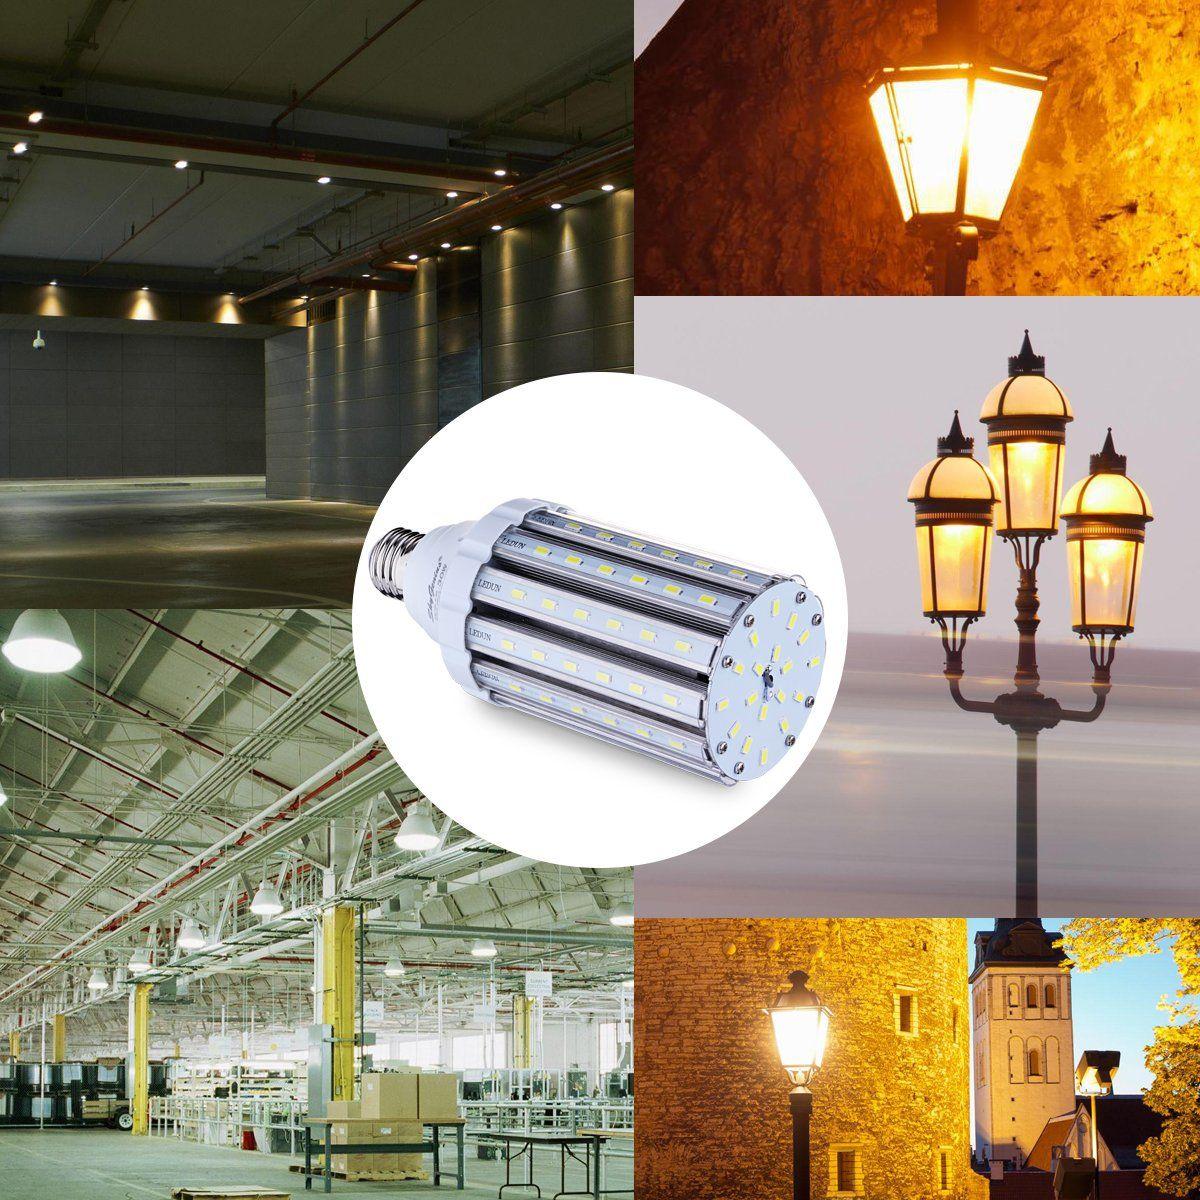 35w Daylight Led Corn Light Bulb For Indoor Outdoor Large Area E26 3500lm 6500k Cool Whitefor Street Lamp Post Lighting Garage Fac Saving Light Lamp Bulb Bulb